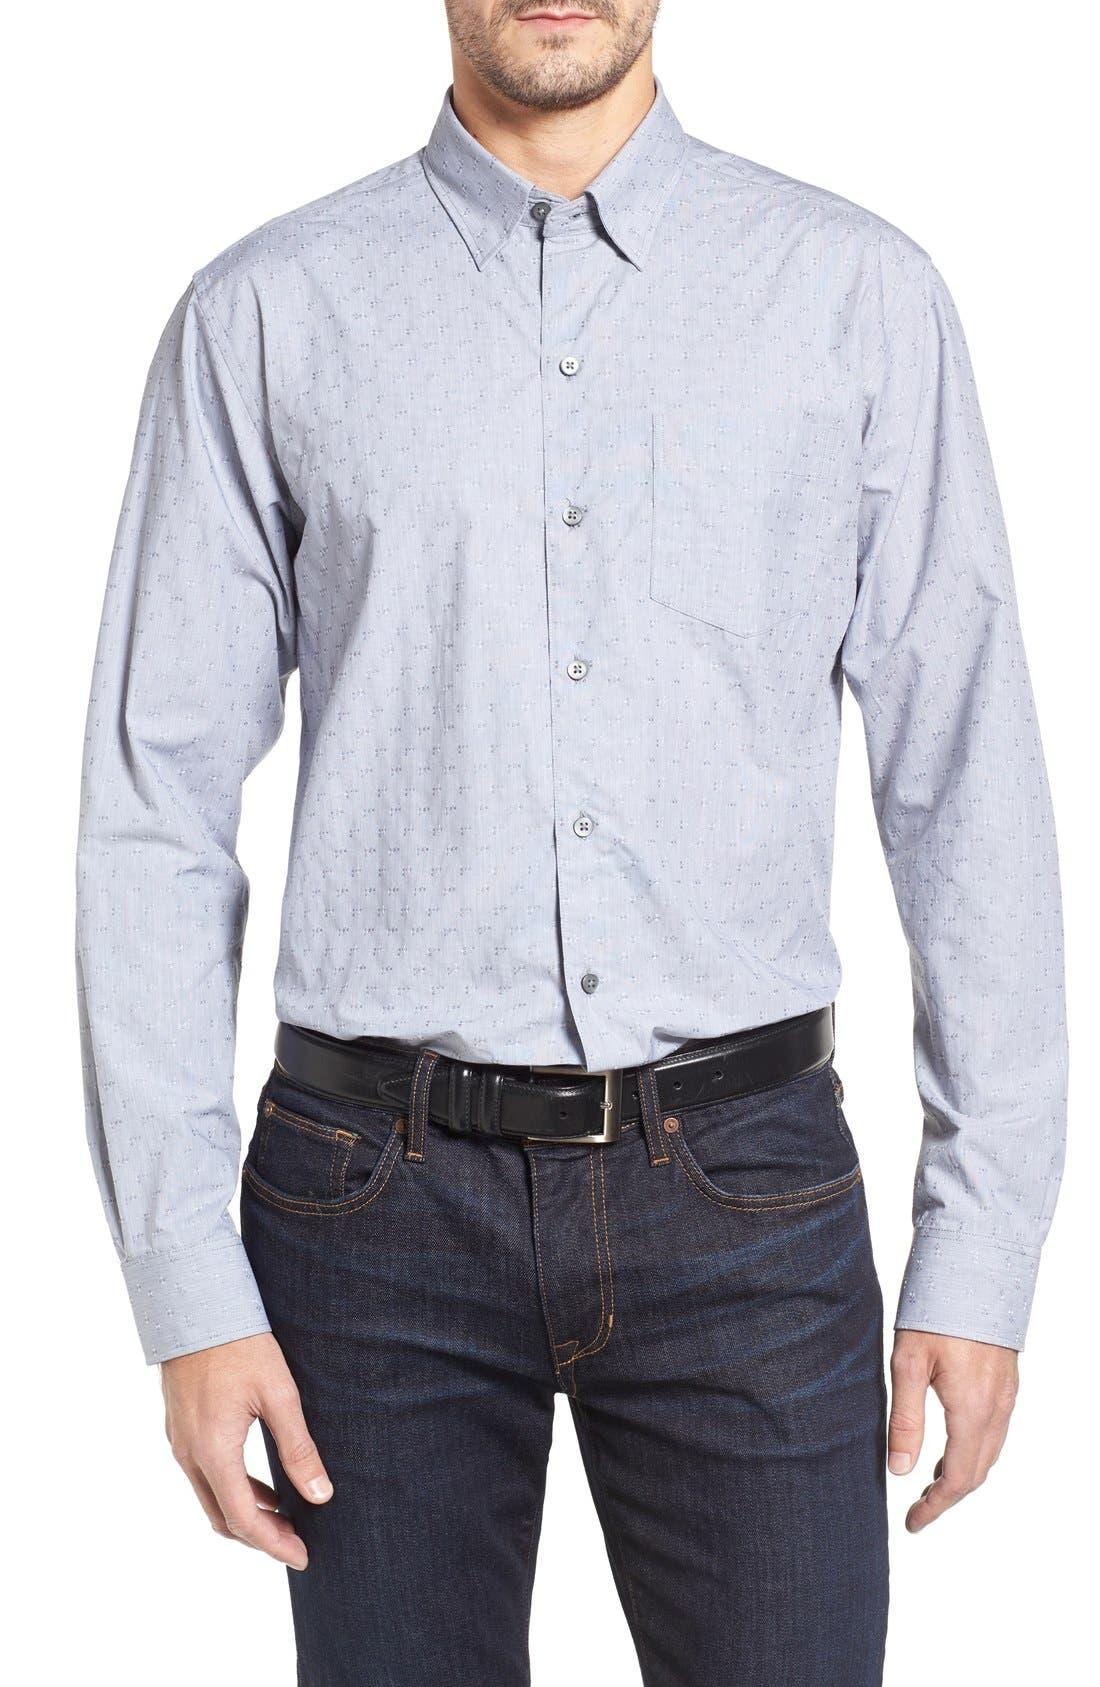 Starboard Jacquard Sport Shirt,                             Main thumbnail 1, color,                             Grey/ Multi